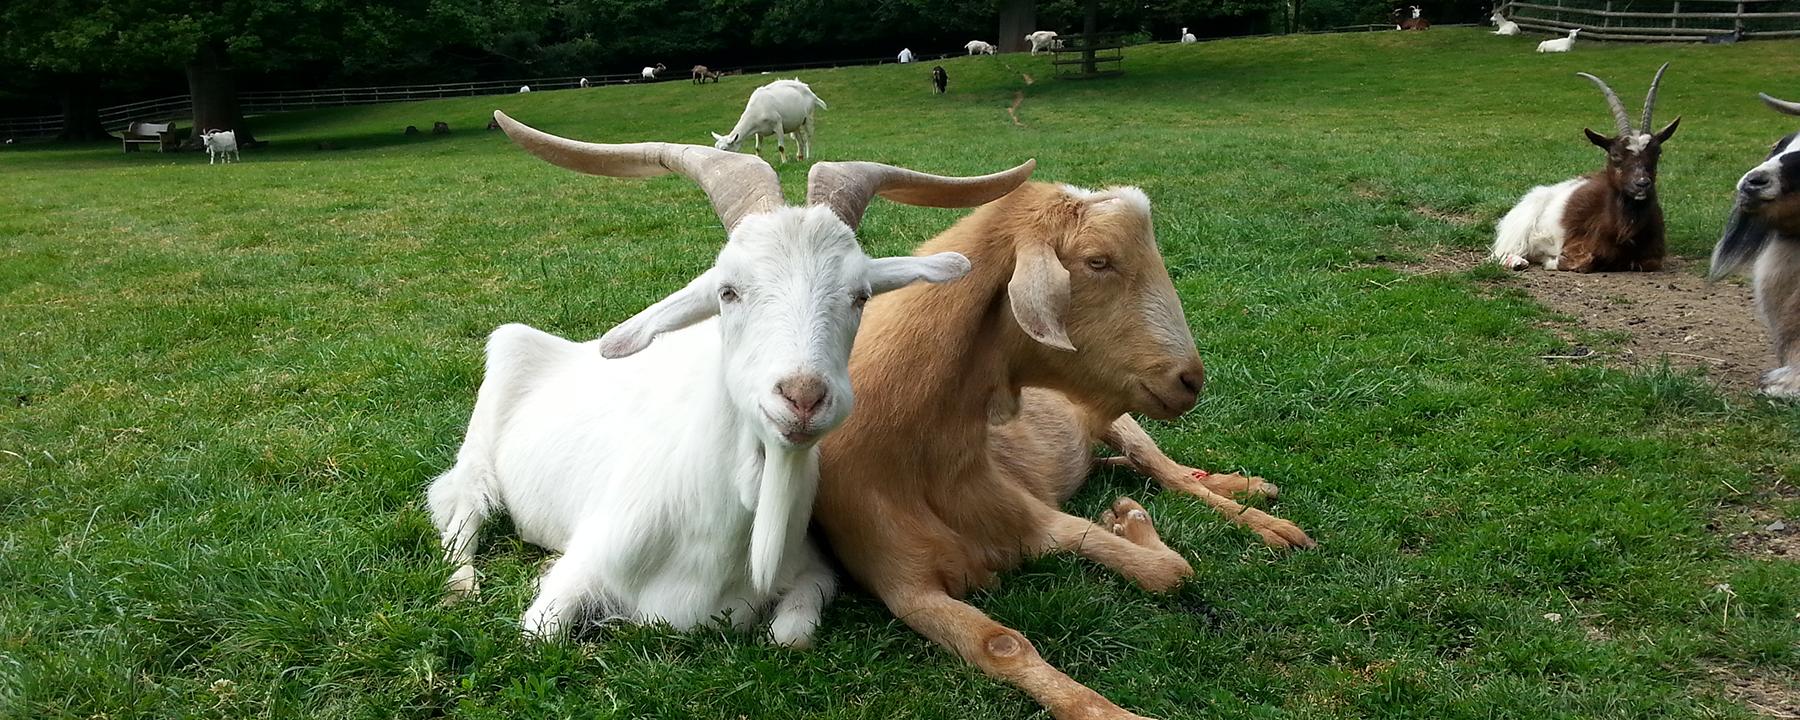 Goats Prefer Happy Human Faces